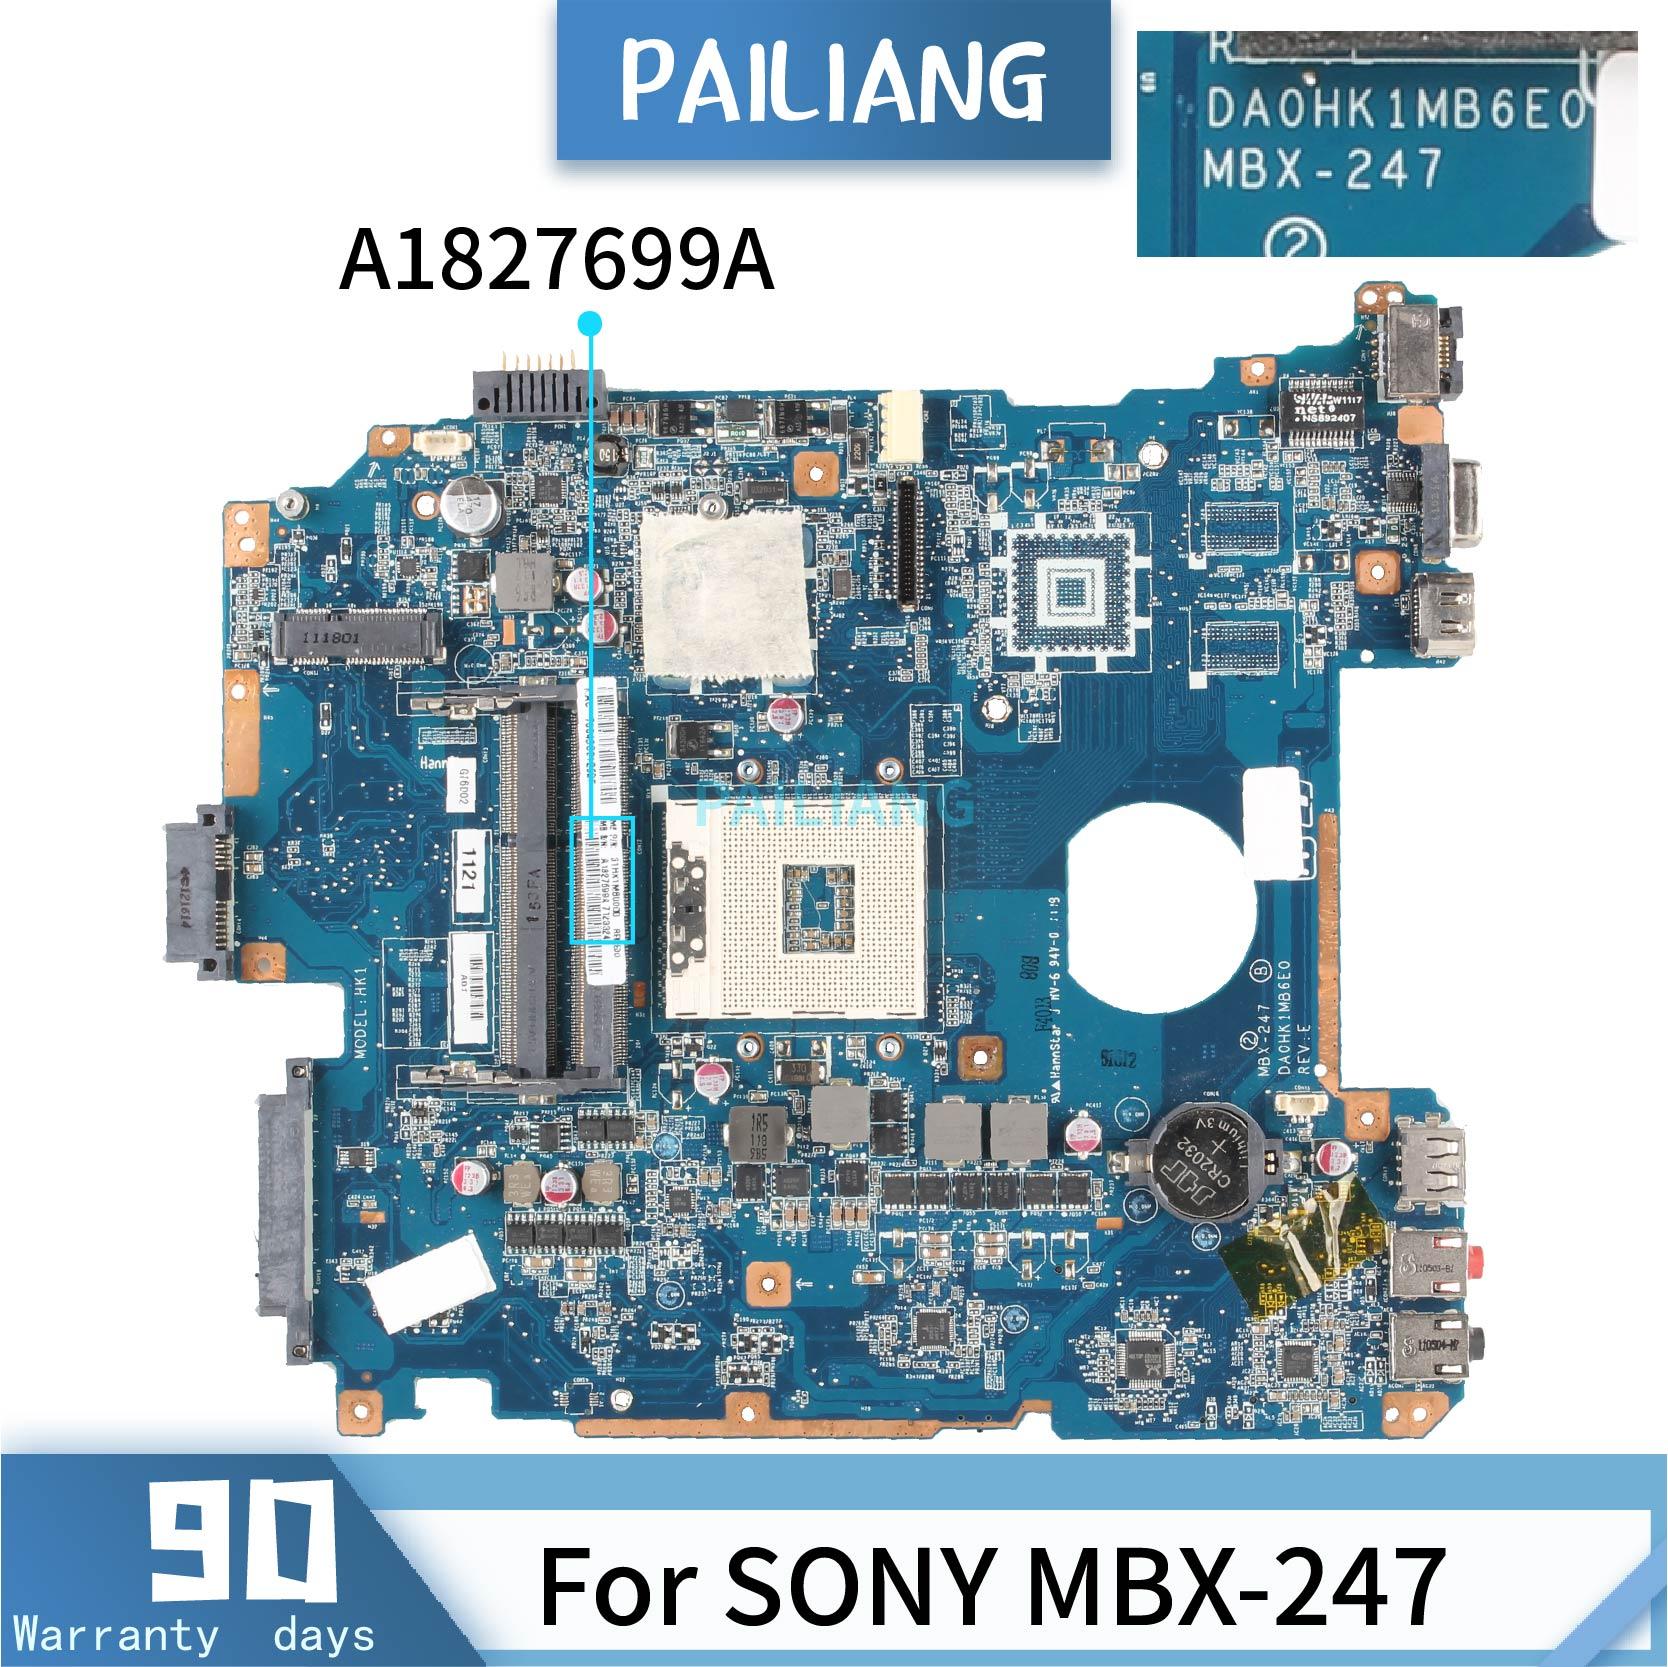 PAILIANG اللوحة الأم للكمبيوتر المحمول لينوفو ثينك باد اليوغا 370 الأساسية SR2ZV i7-7500U اللوحة الرئيسية LA-E291P اختبار DDR3